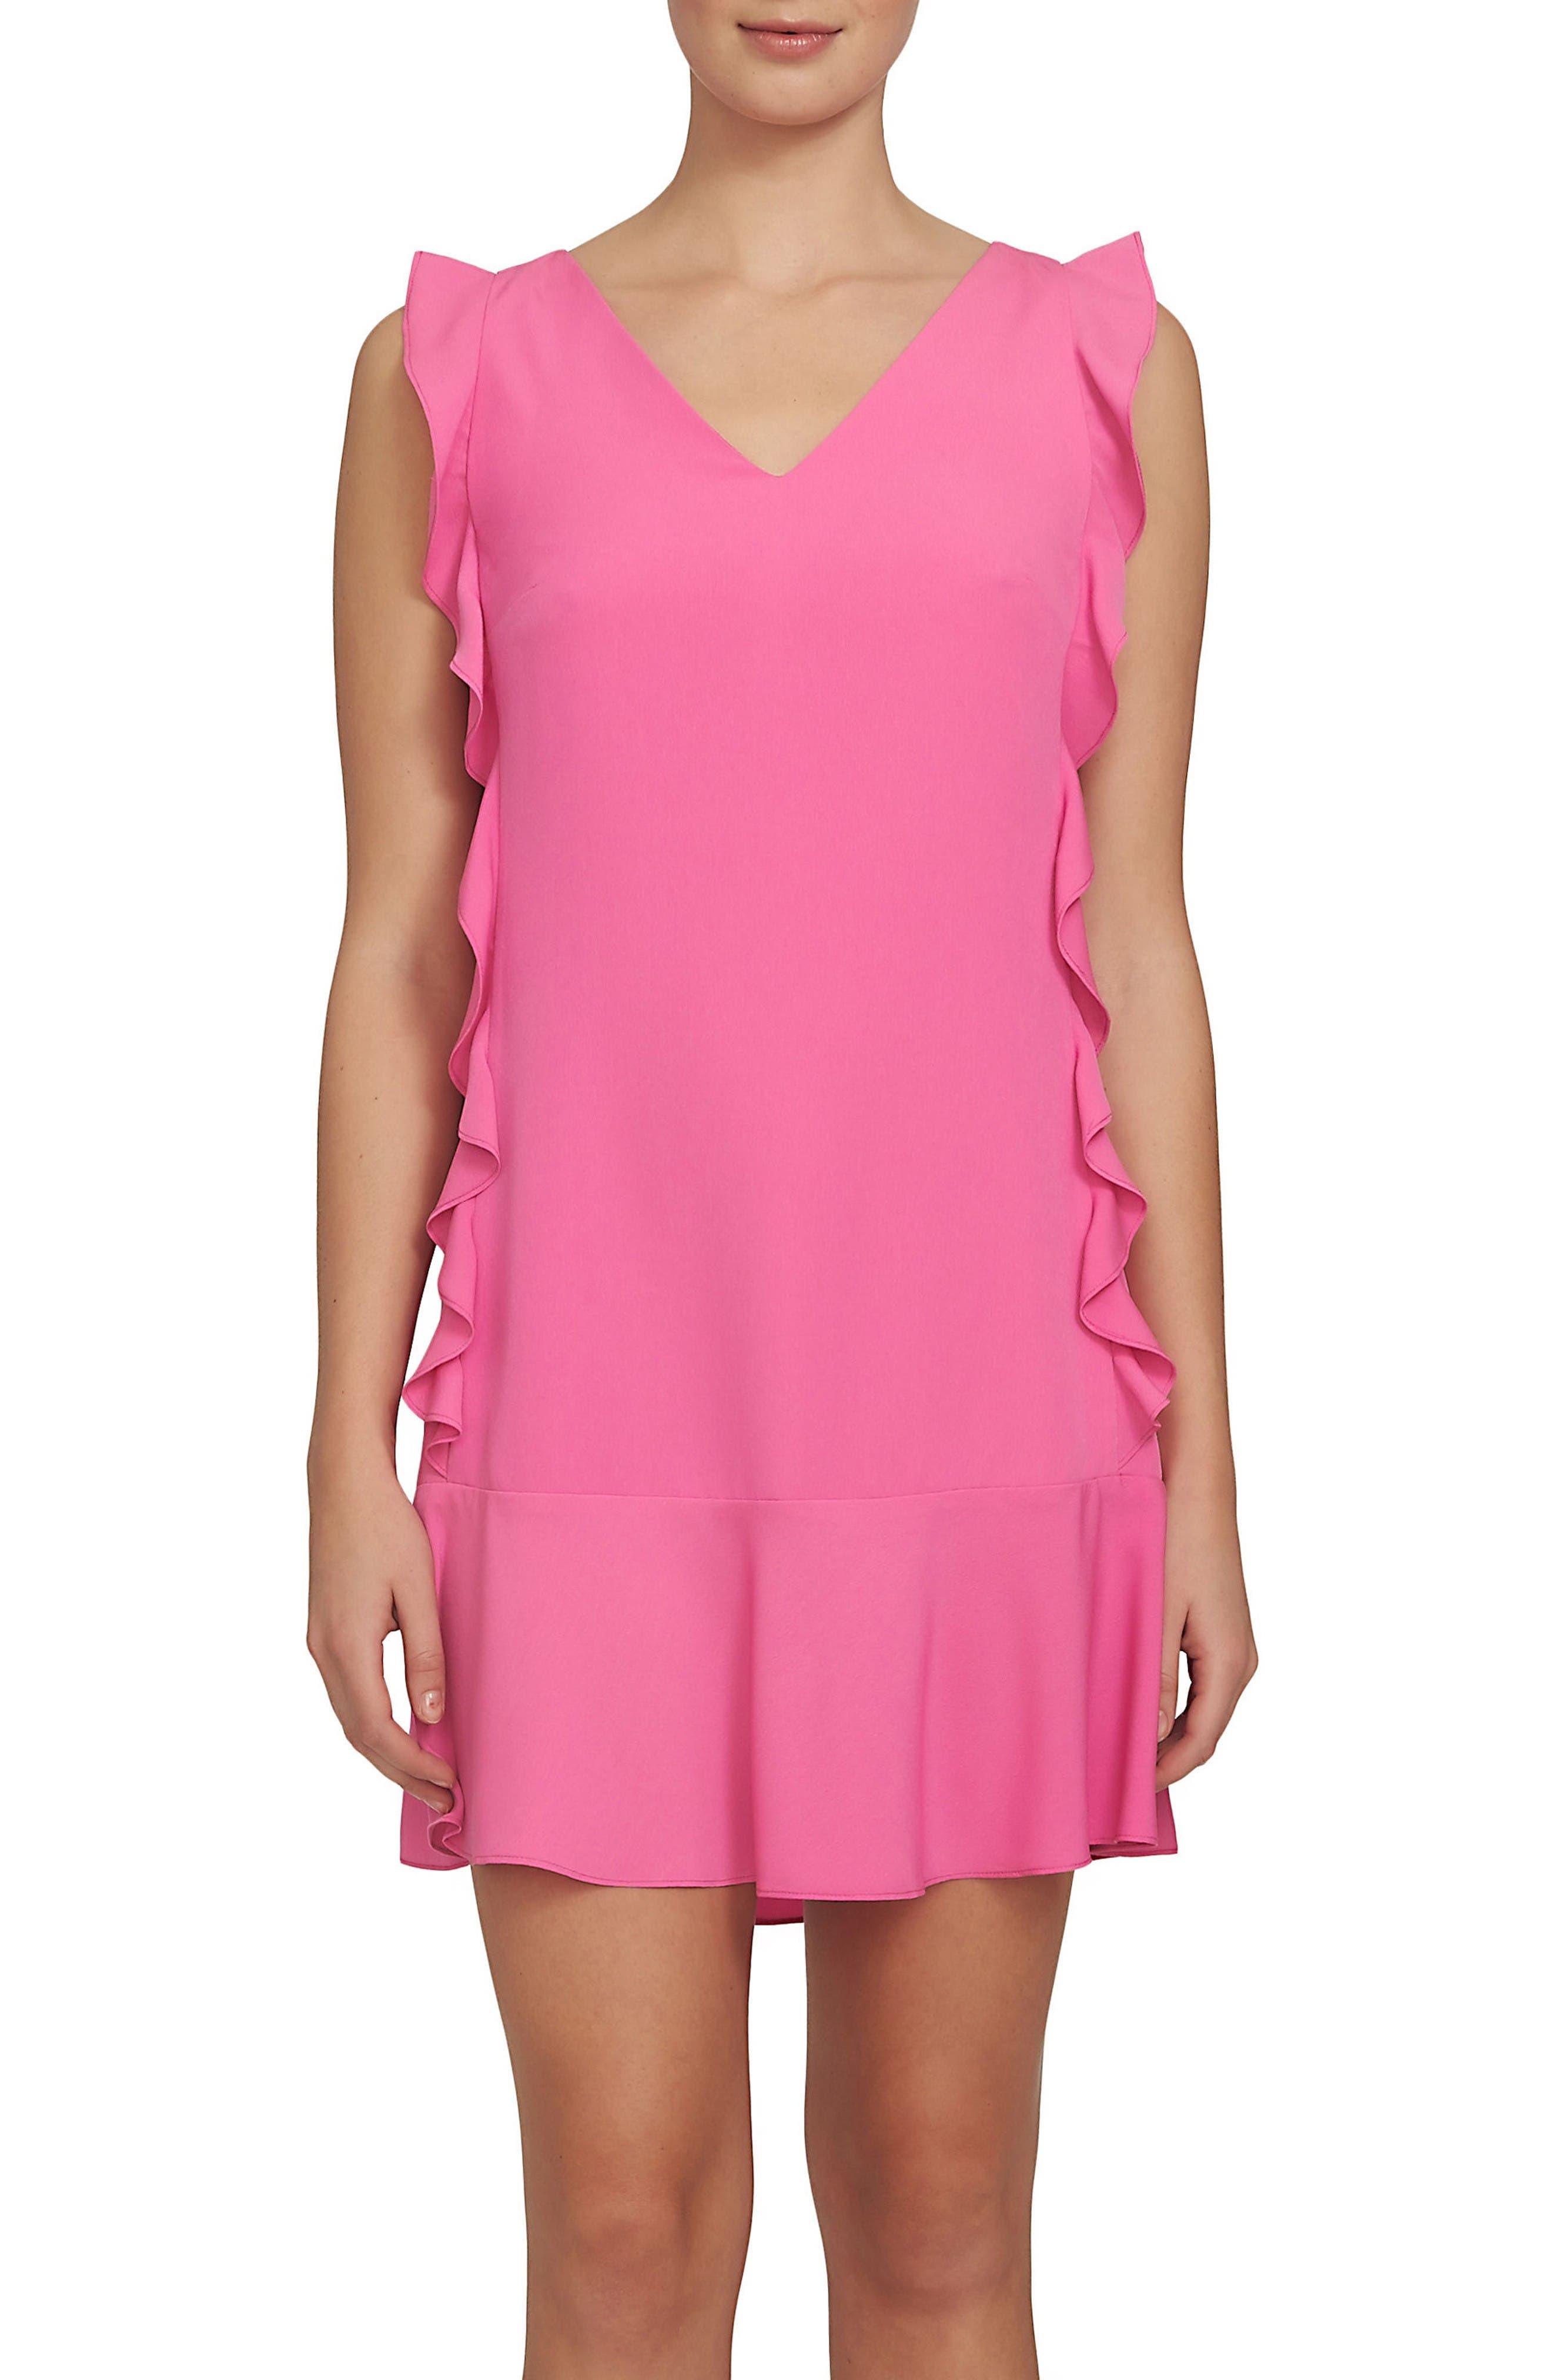 CeCe Harper Ruffle Dress